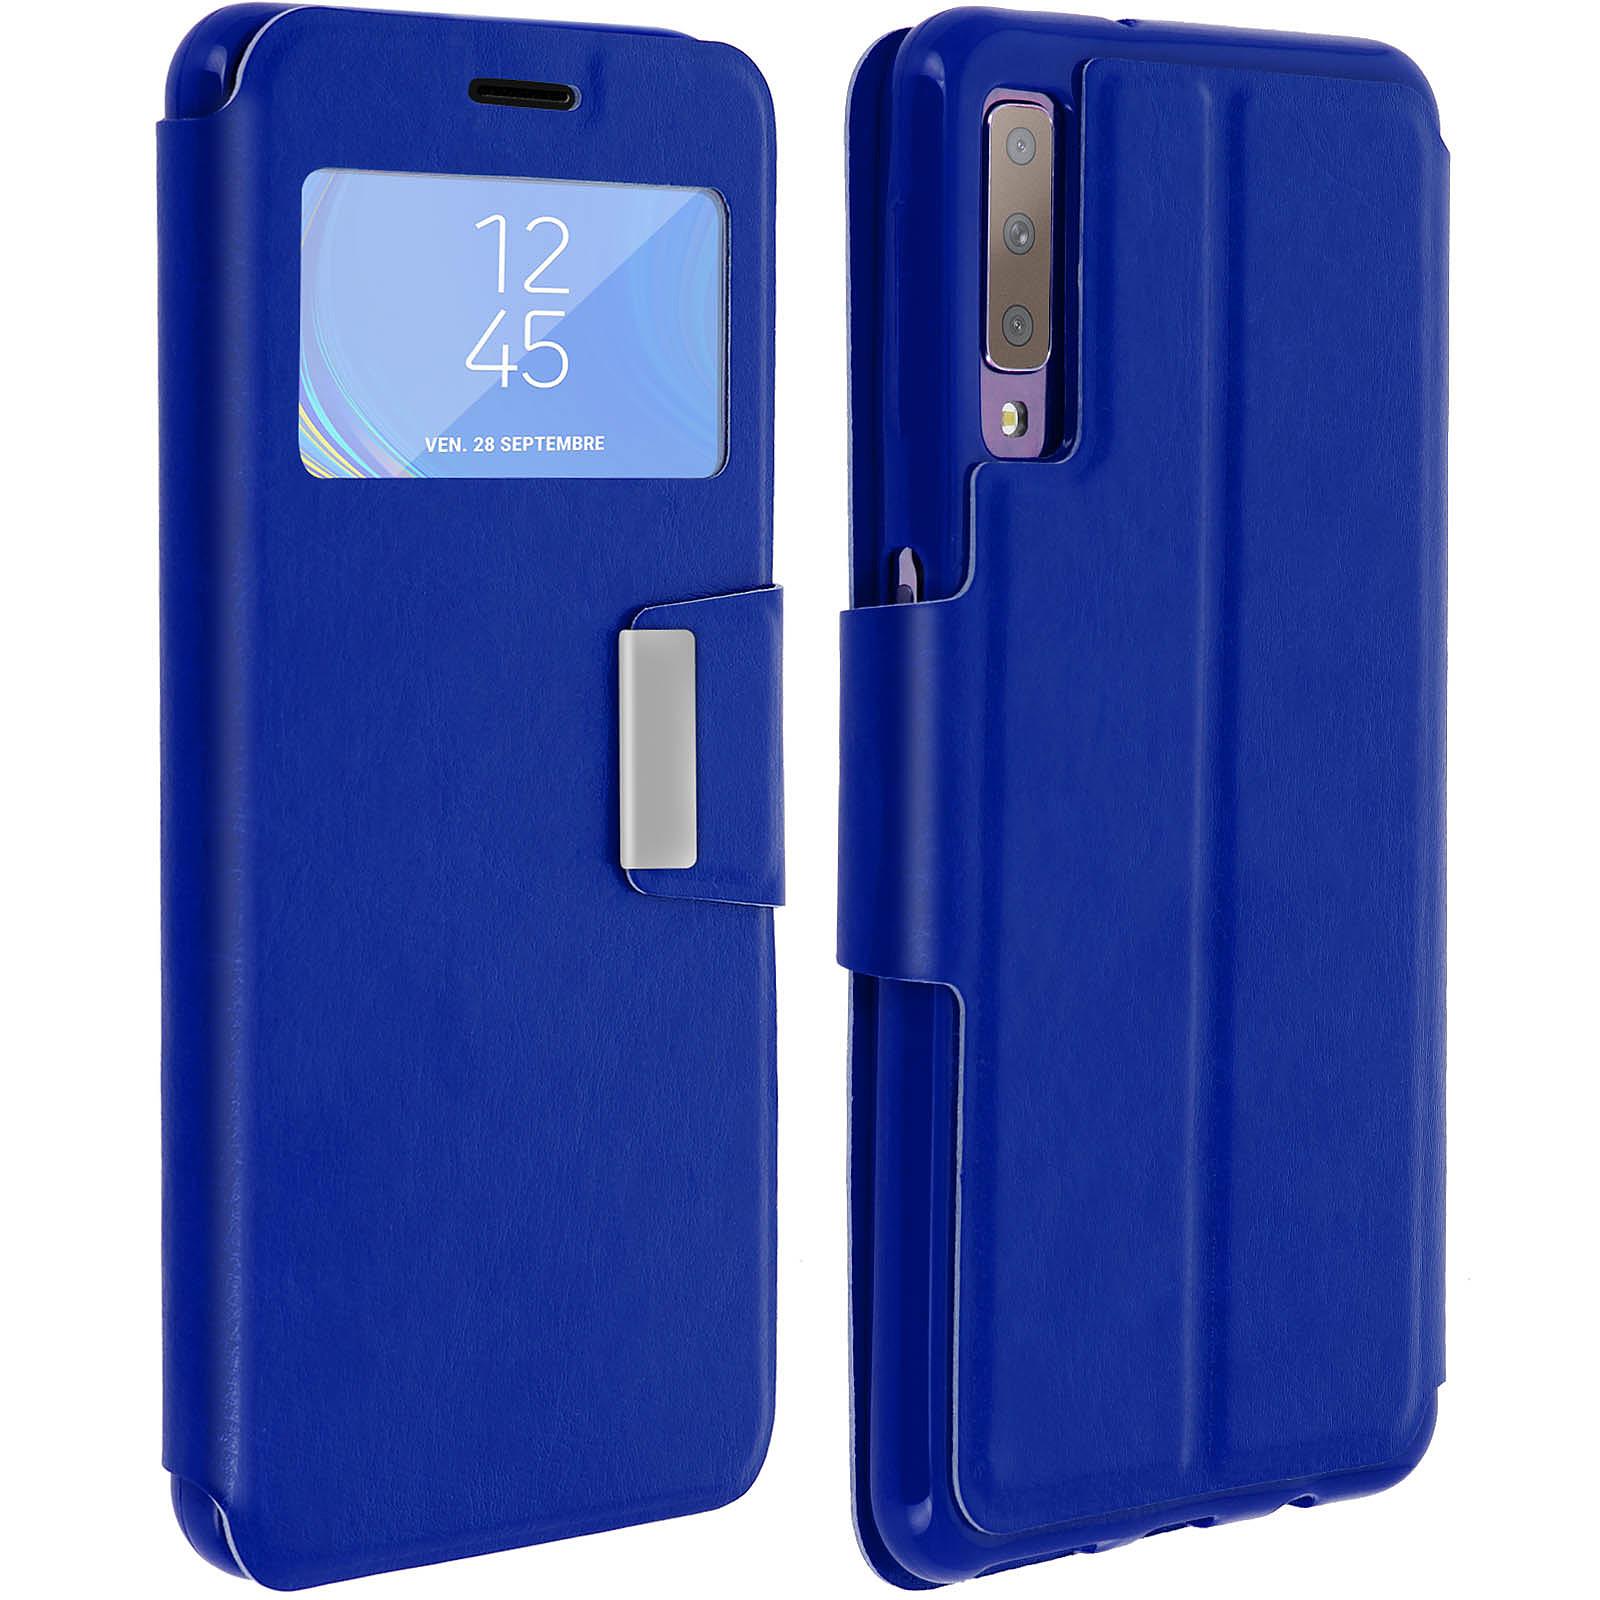 Avizar Etui folio Bleu pour Samsung Galaxy A7 2018